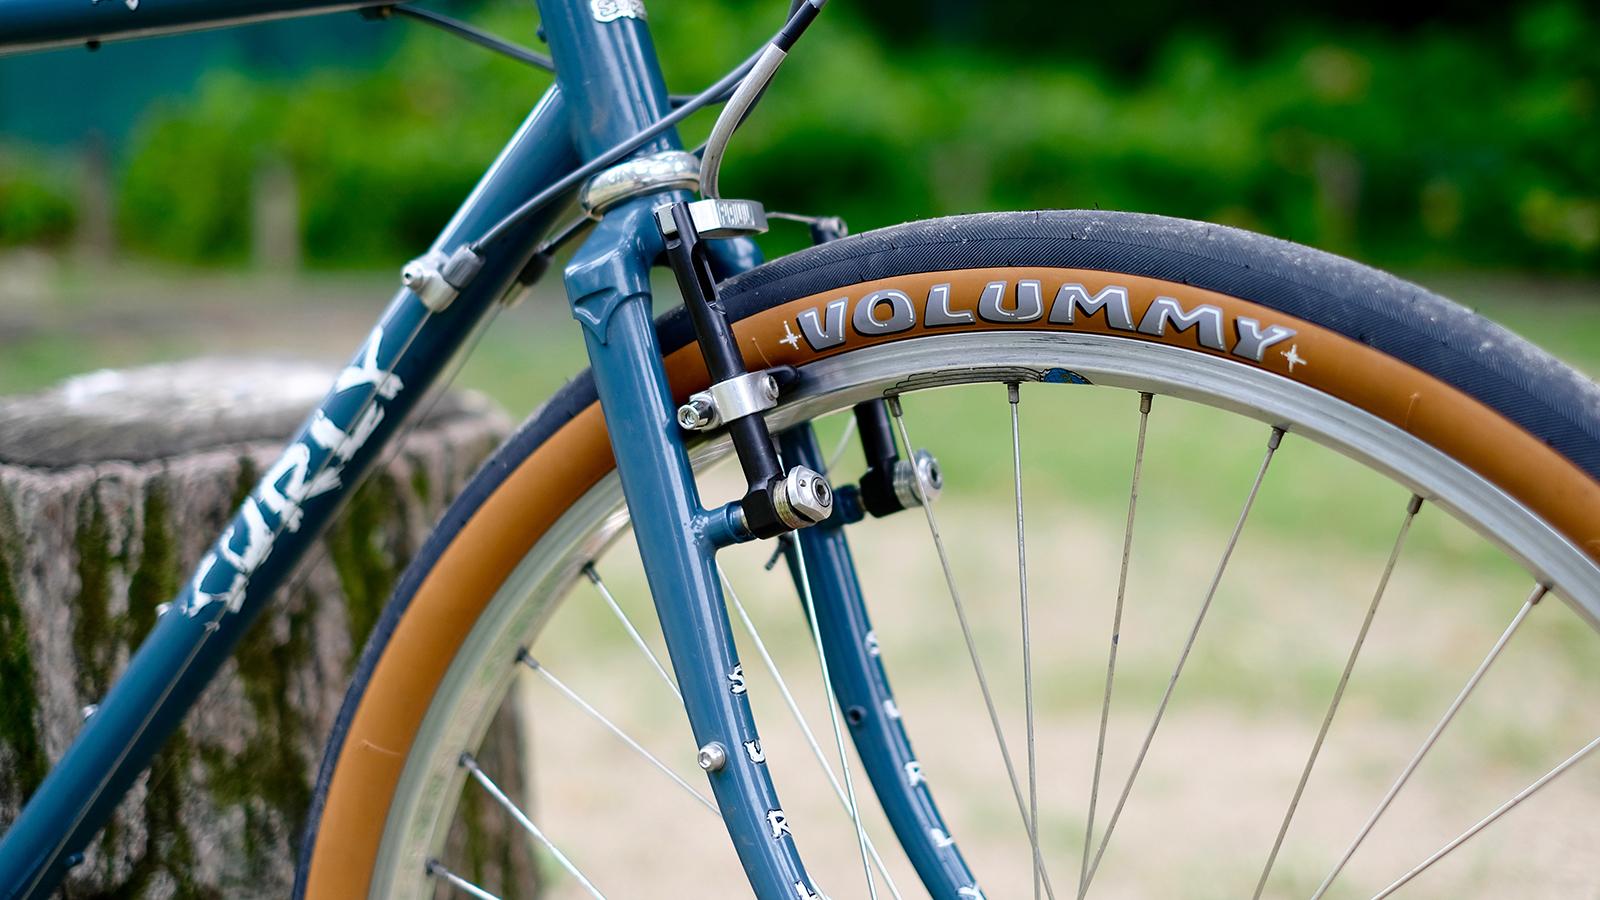 Volummy Tire